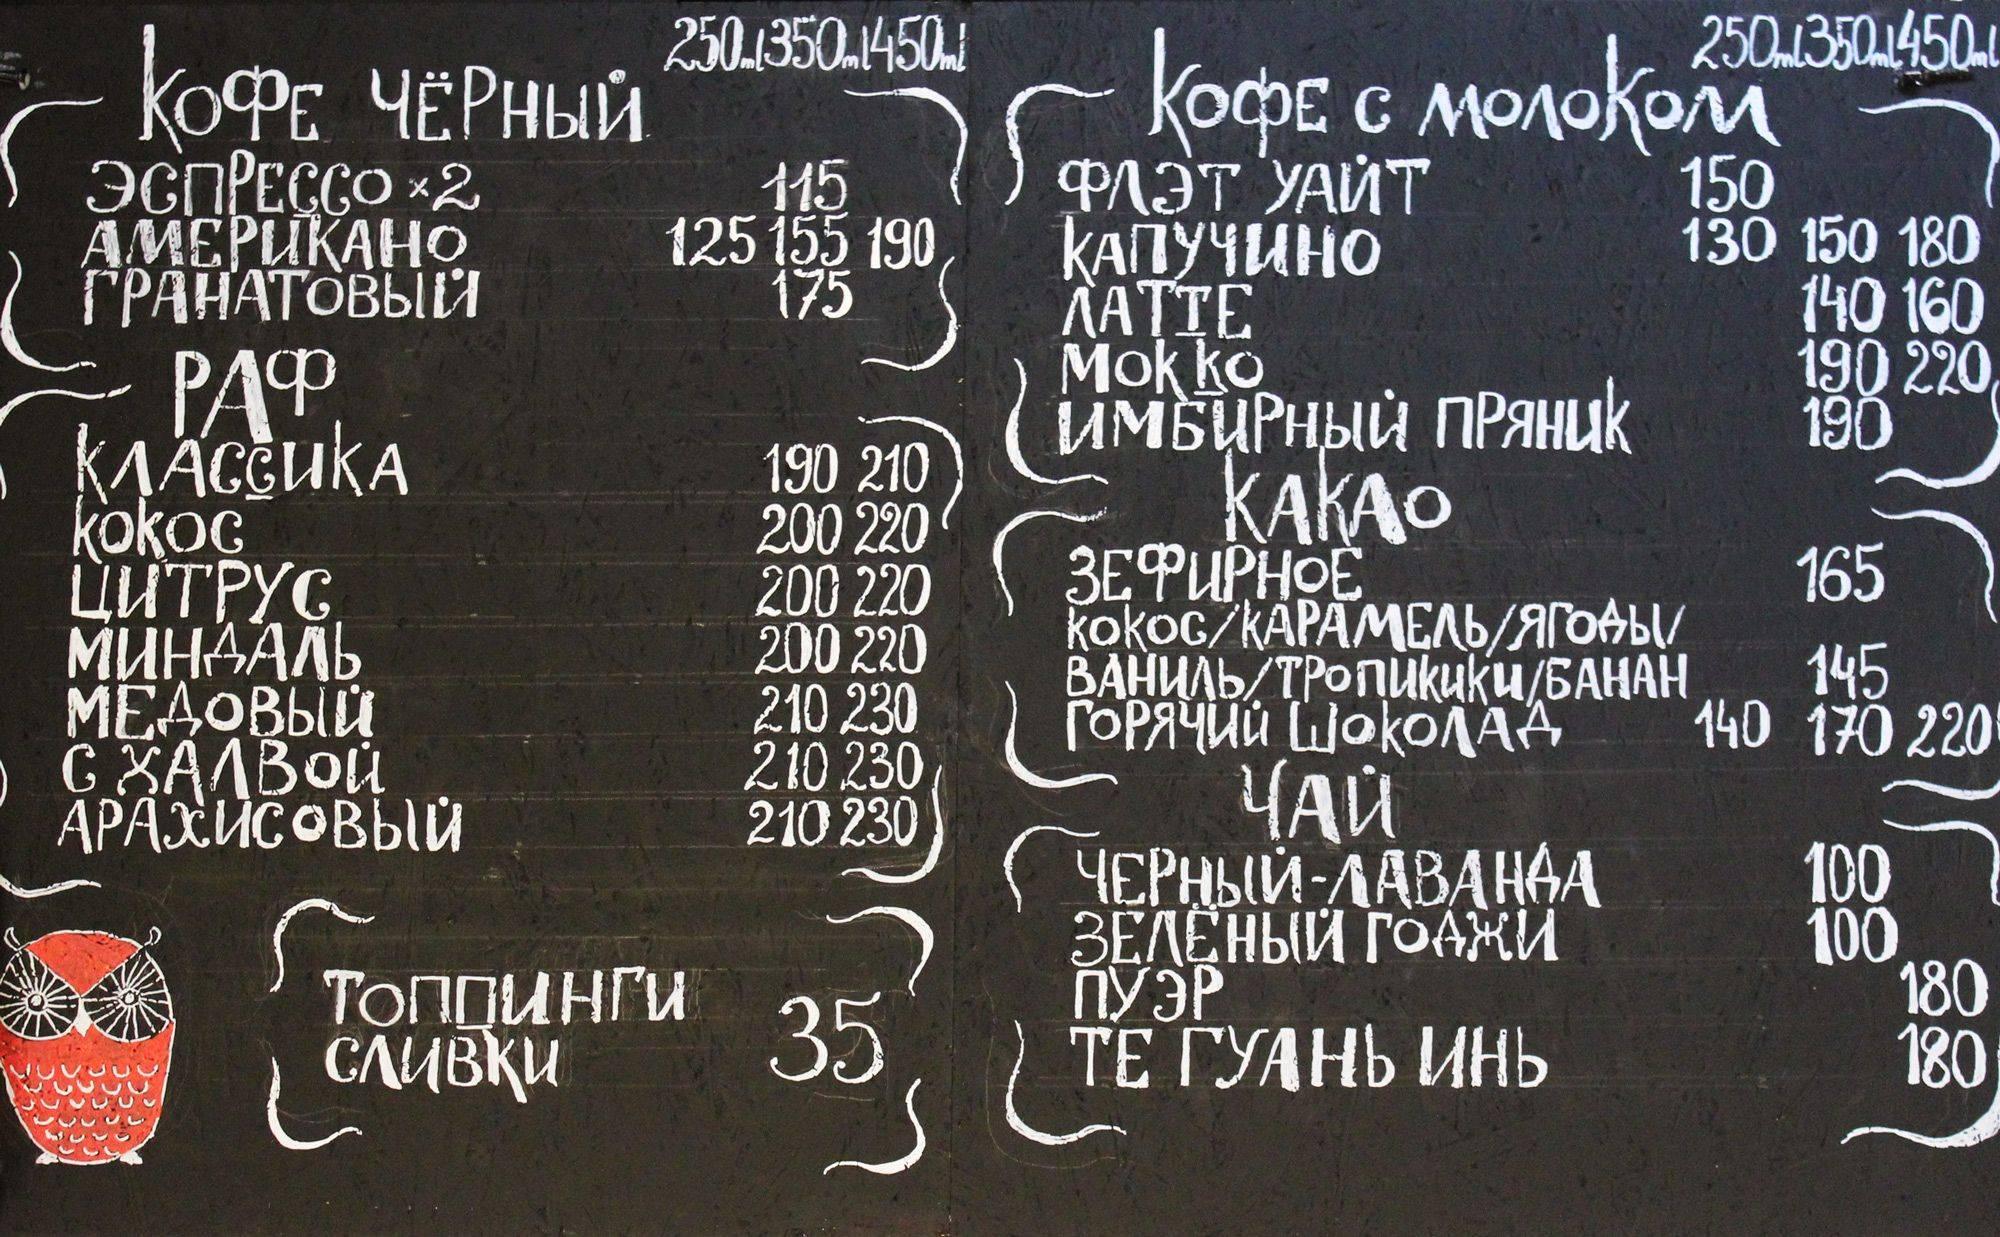 мини кофейня Coffeenat